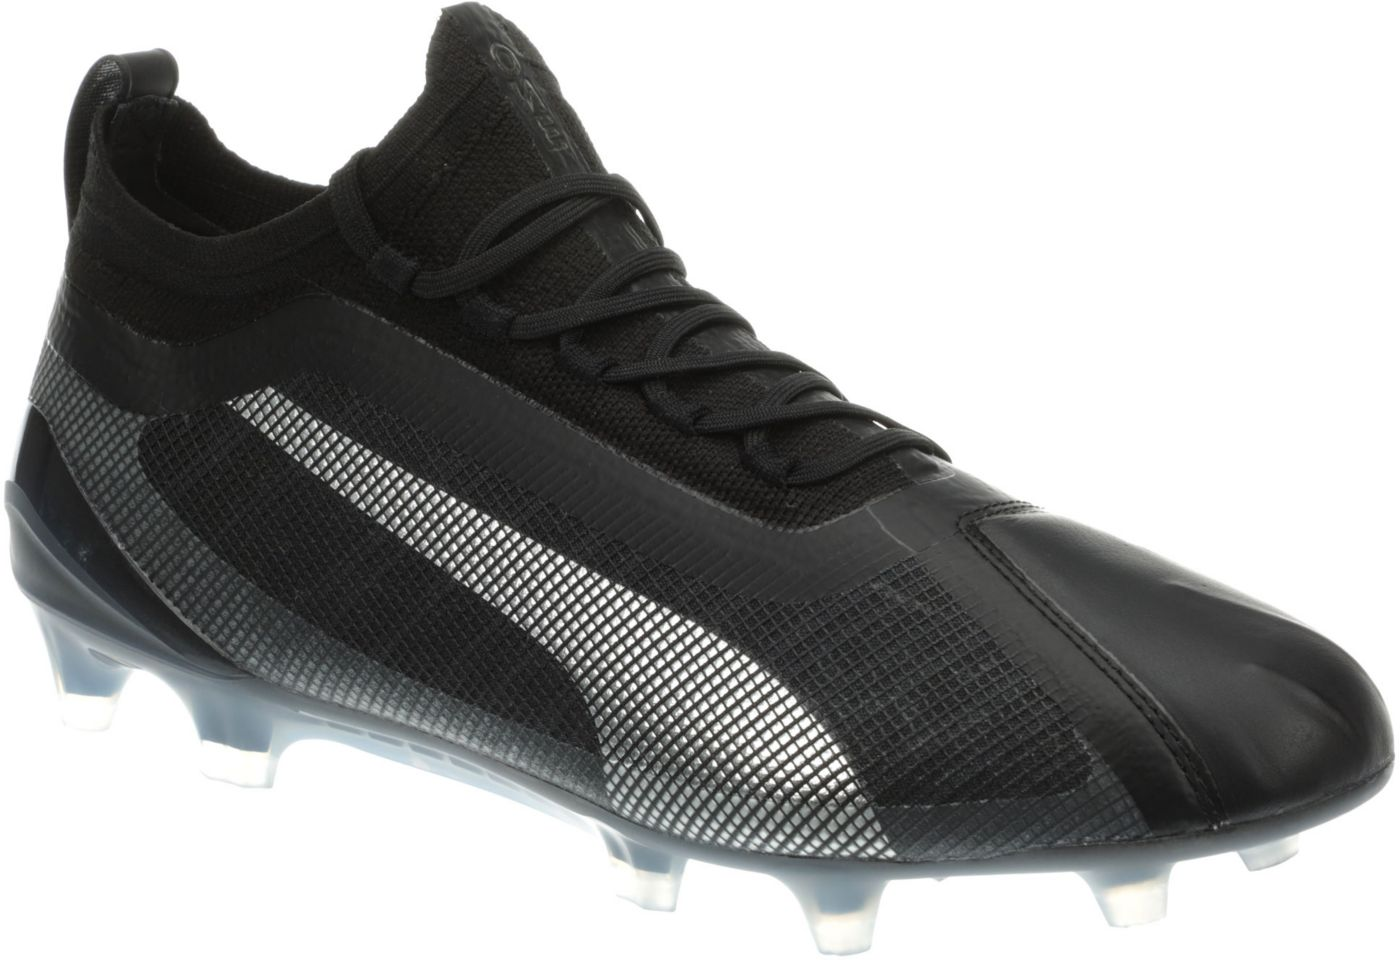 PUMA Men's ONE 5.1 FG/AG Soccer Cleats